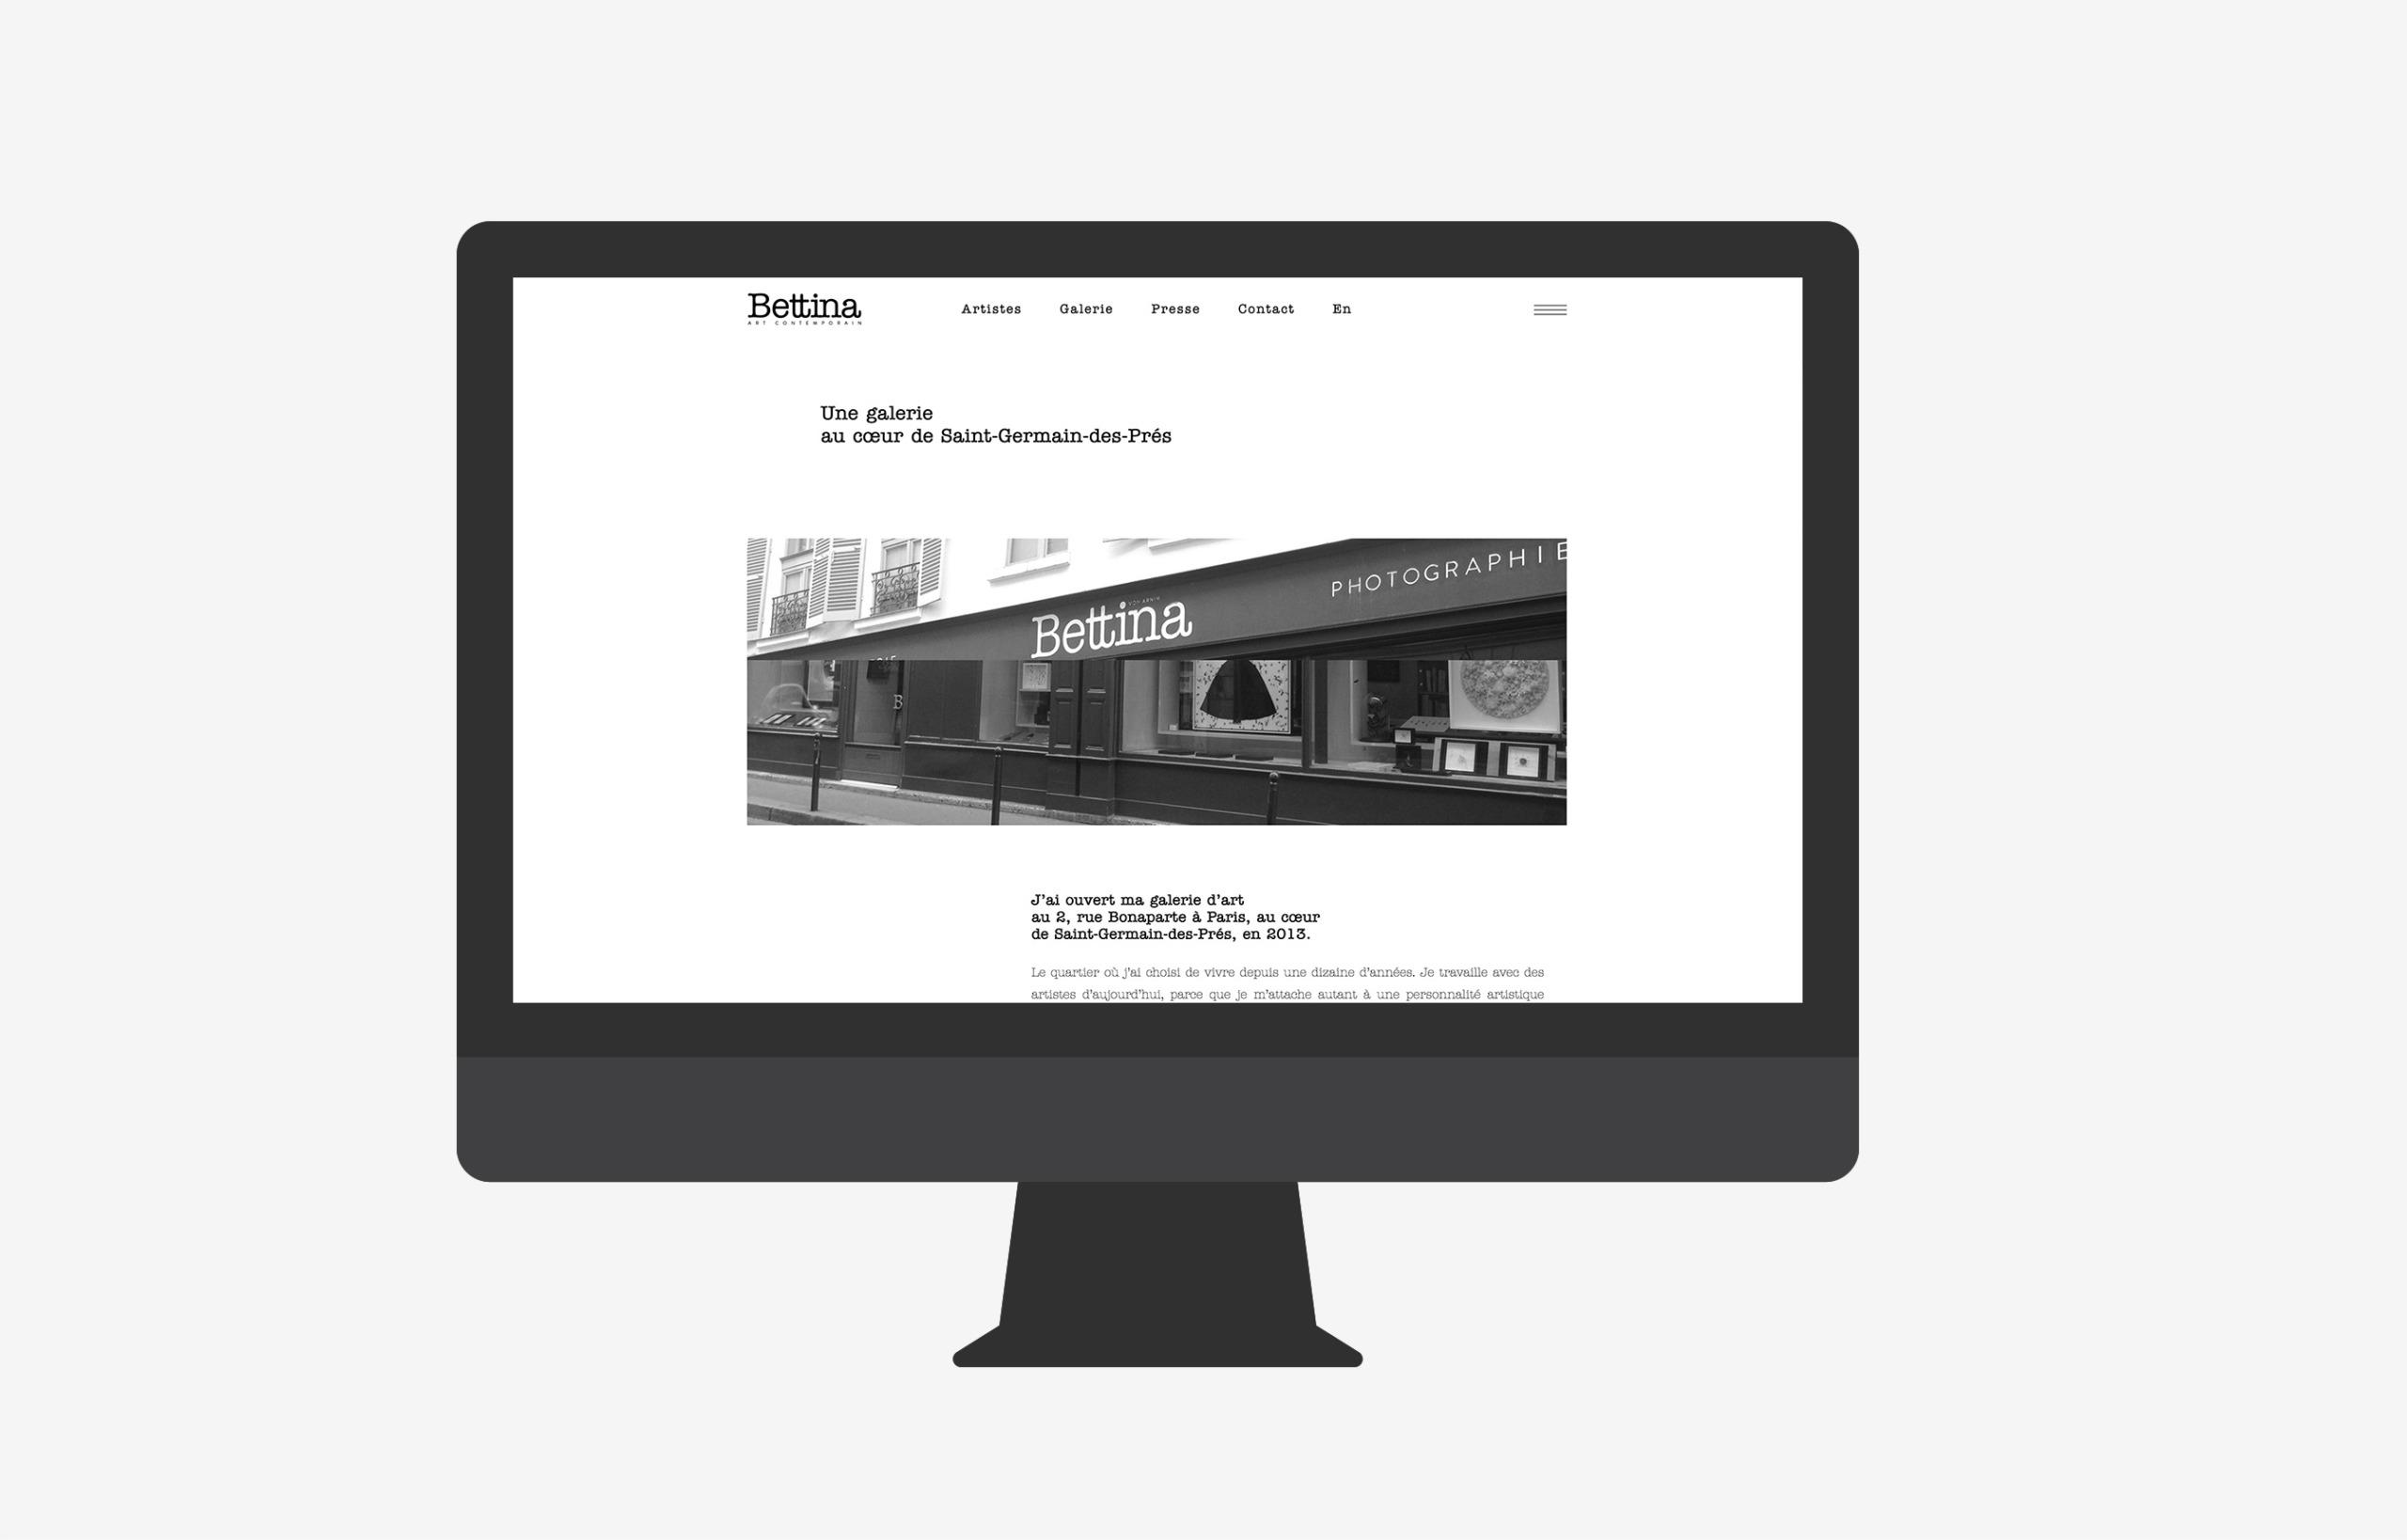 03-bettina-pikteo-webdesign-graphic-design-freelance-paris-bruxelles-londres